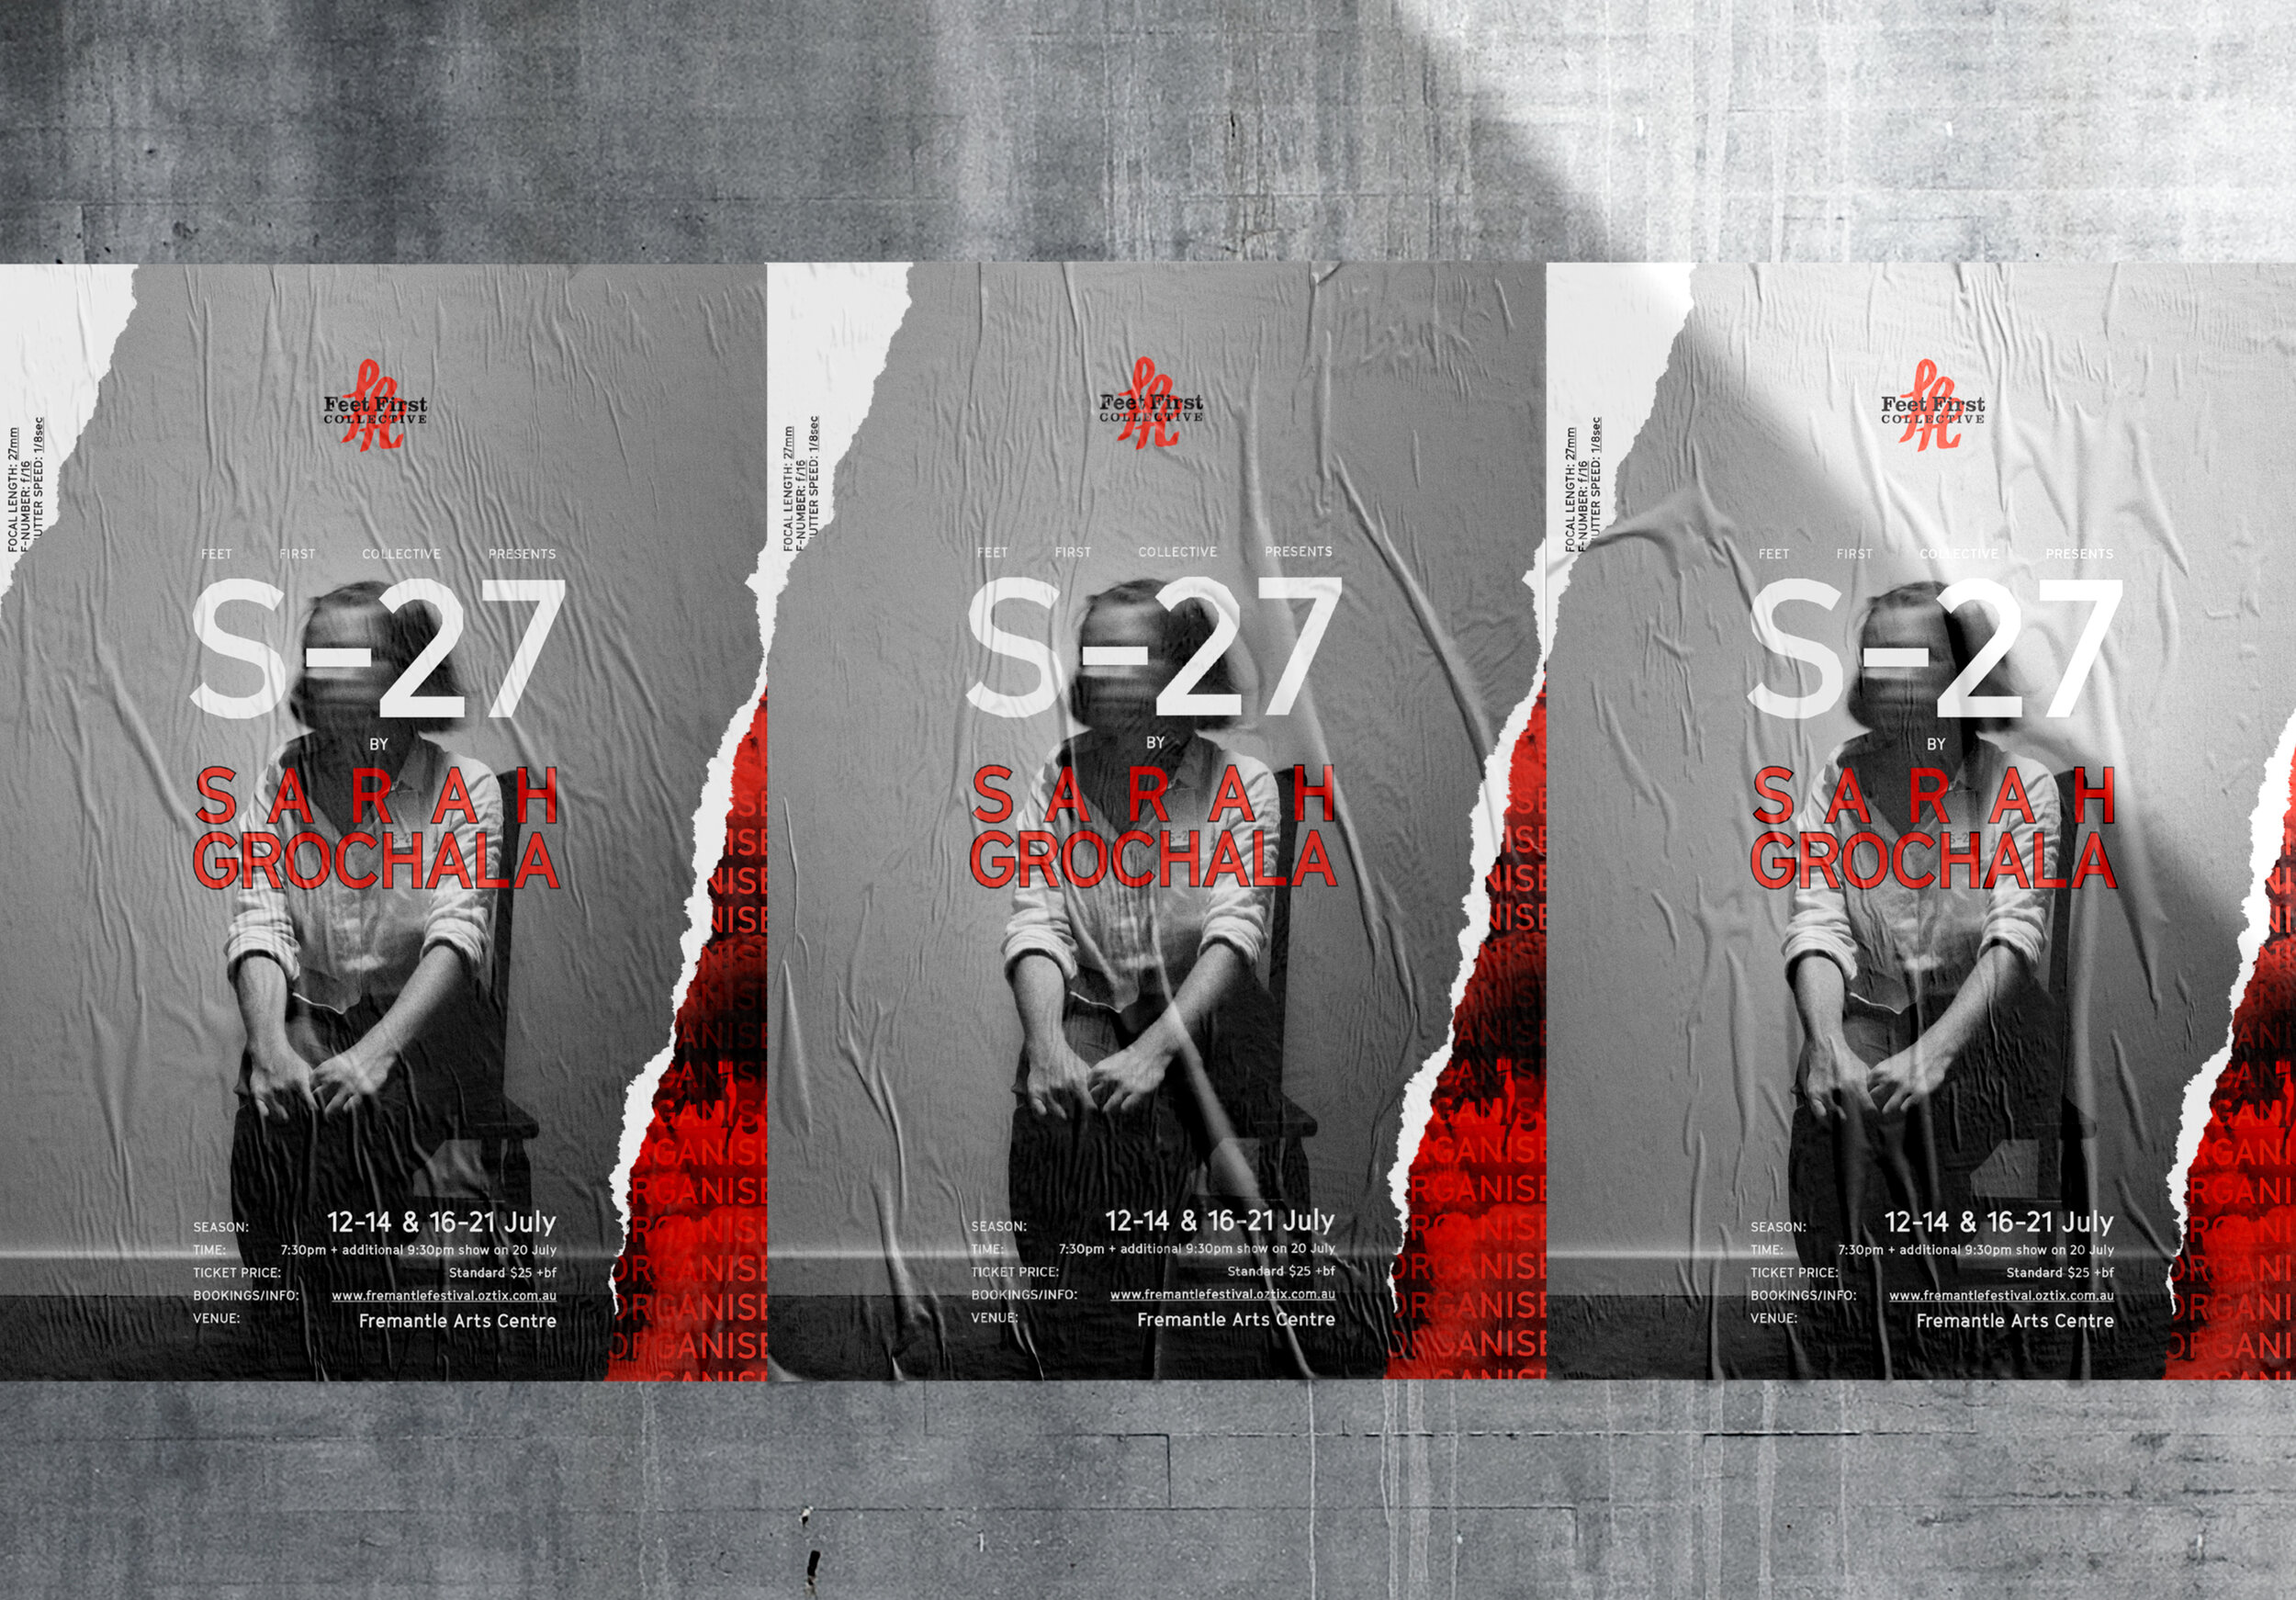 S-27_7.jpg